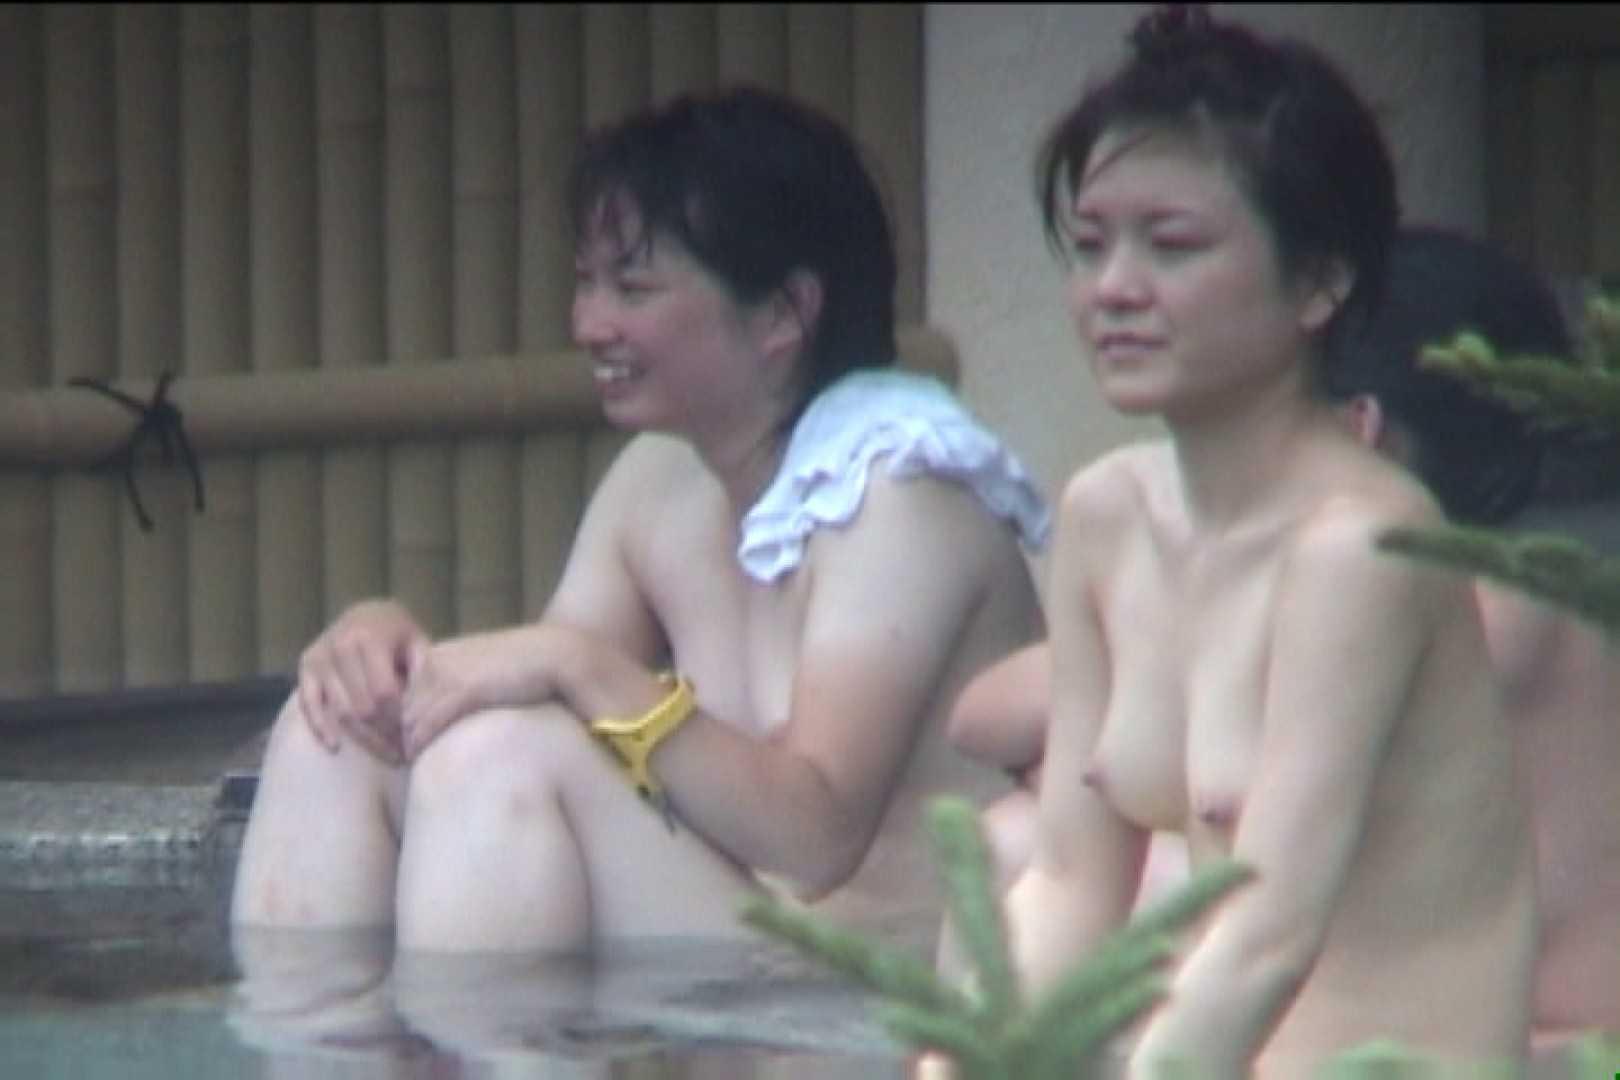 Aquaな露天風呂Vol.94【VIP限定】 露天風呂  11枚 2